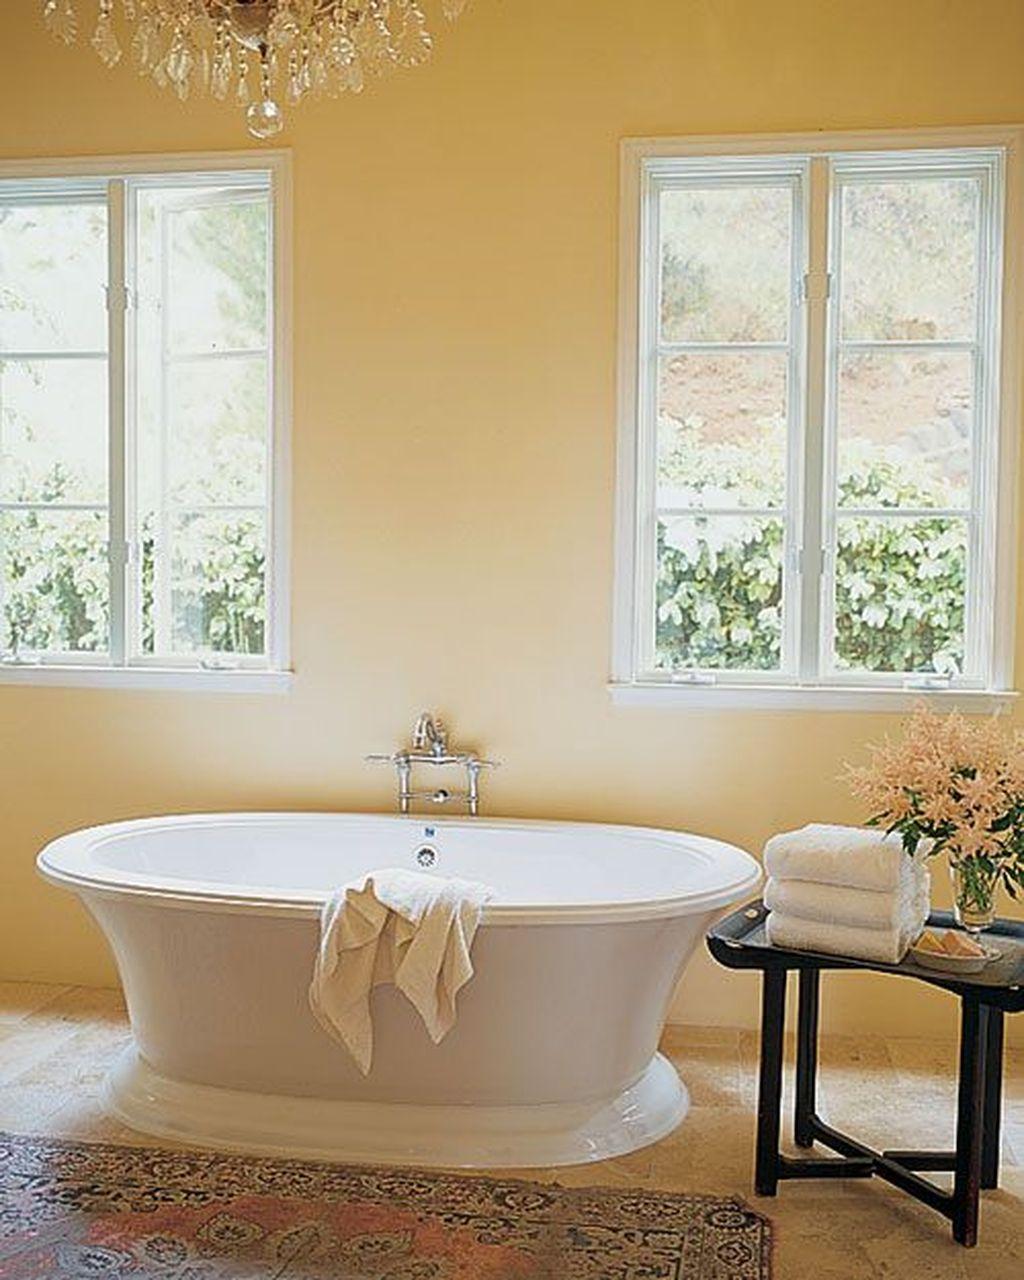 Creative Sunny Yellow Bathroom Decor For Summer 21